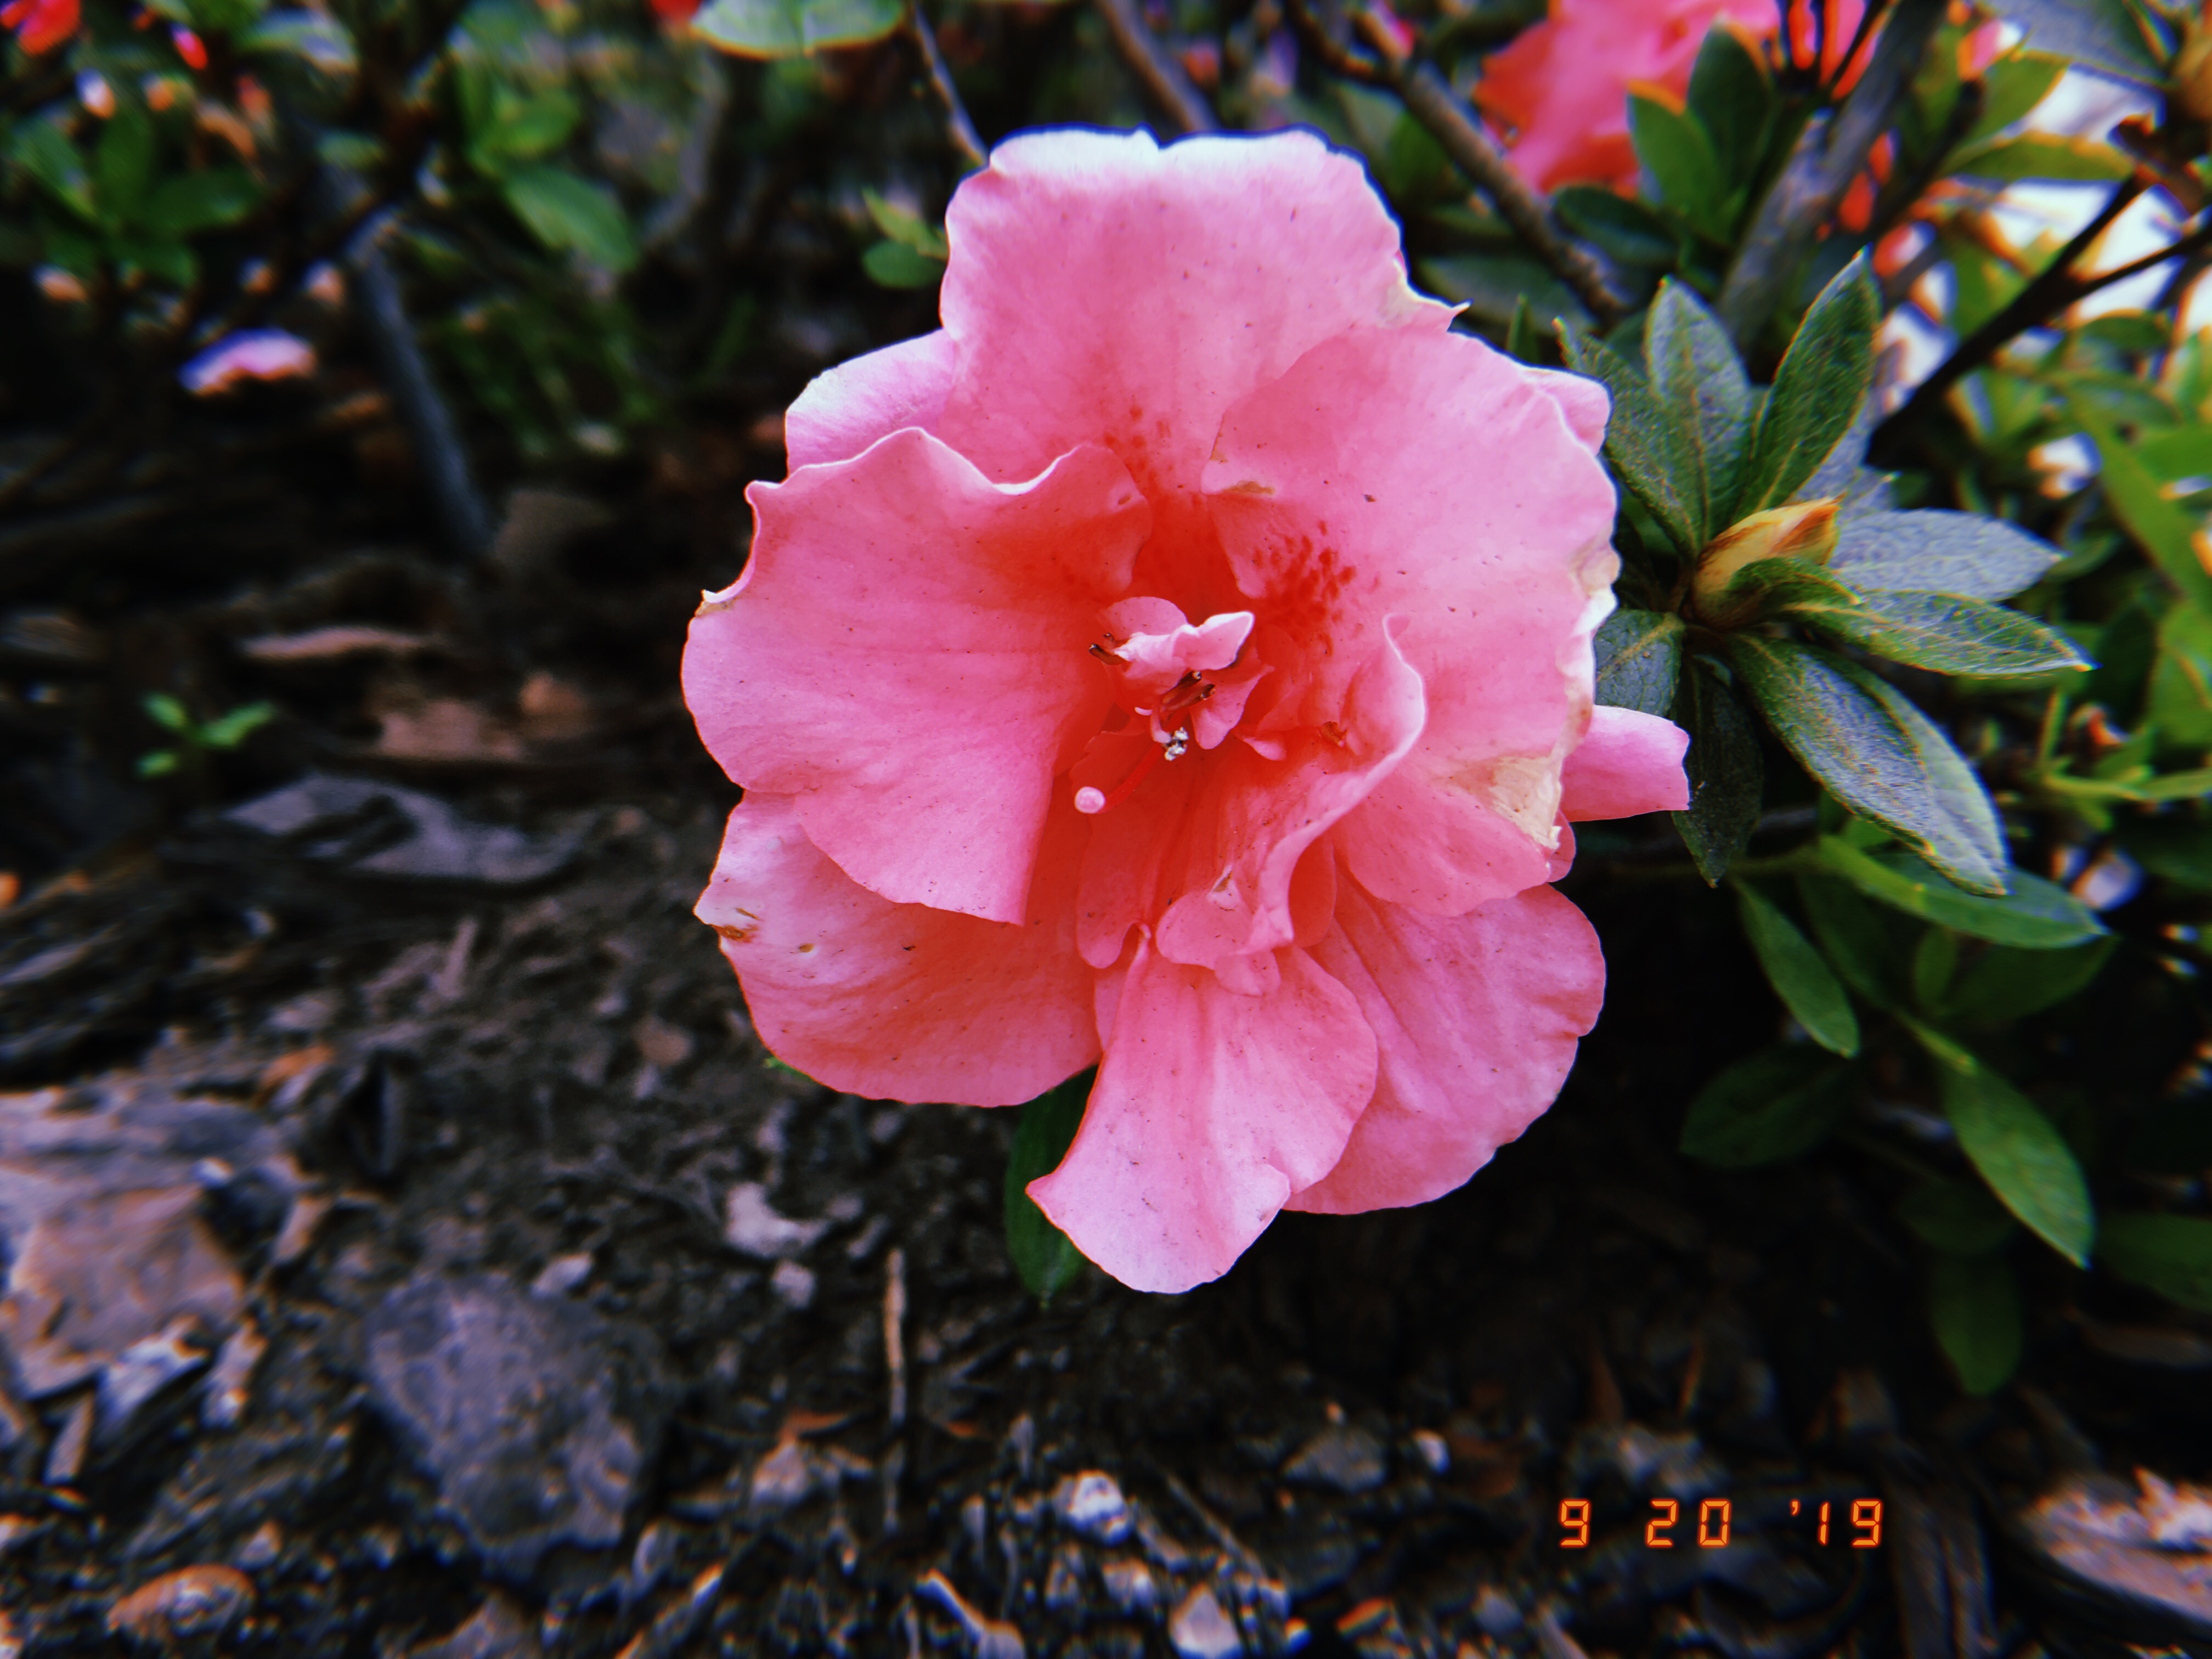 blog-senhorita-deise-ola-primavera-4-3